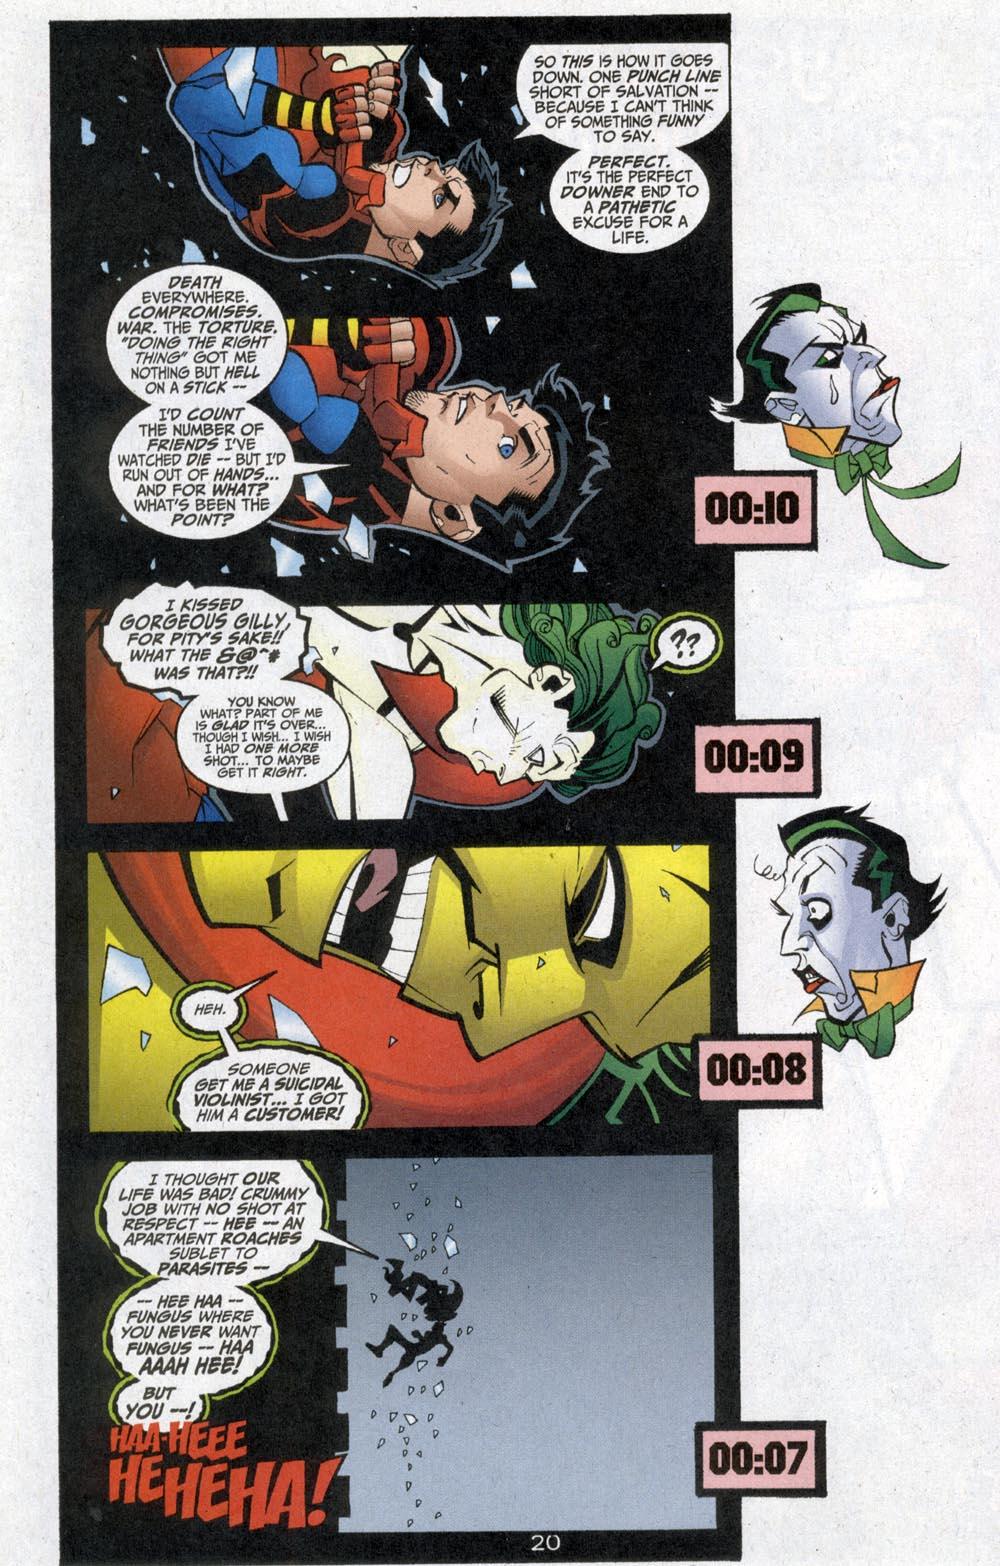 Superboy v3 93 - 20.jpg